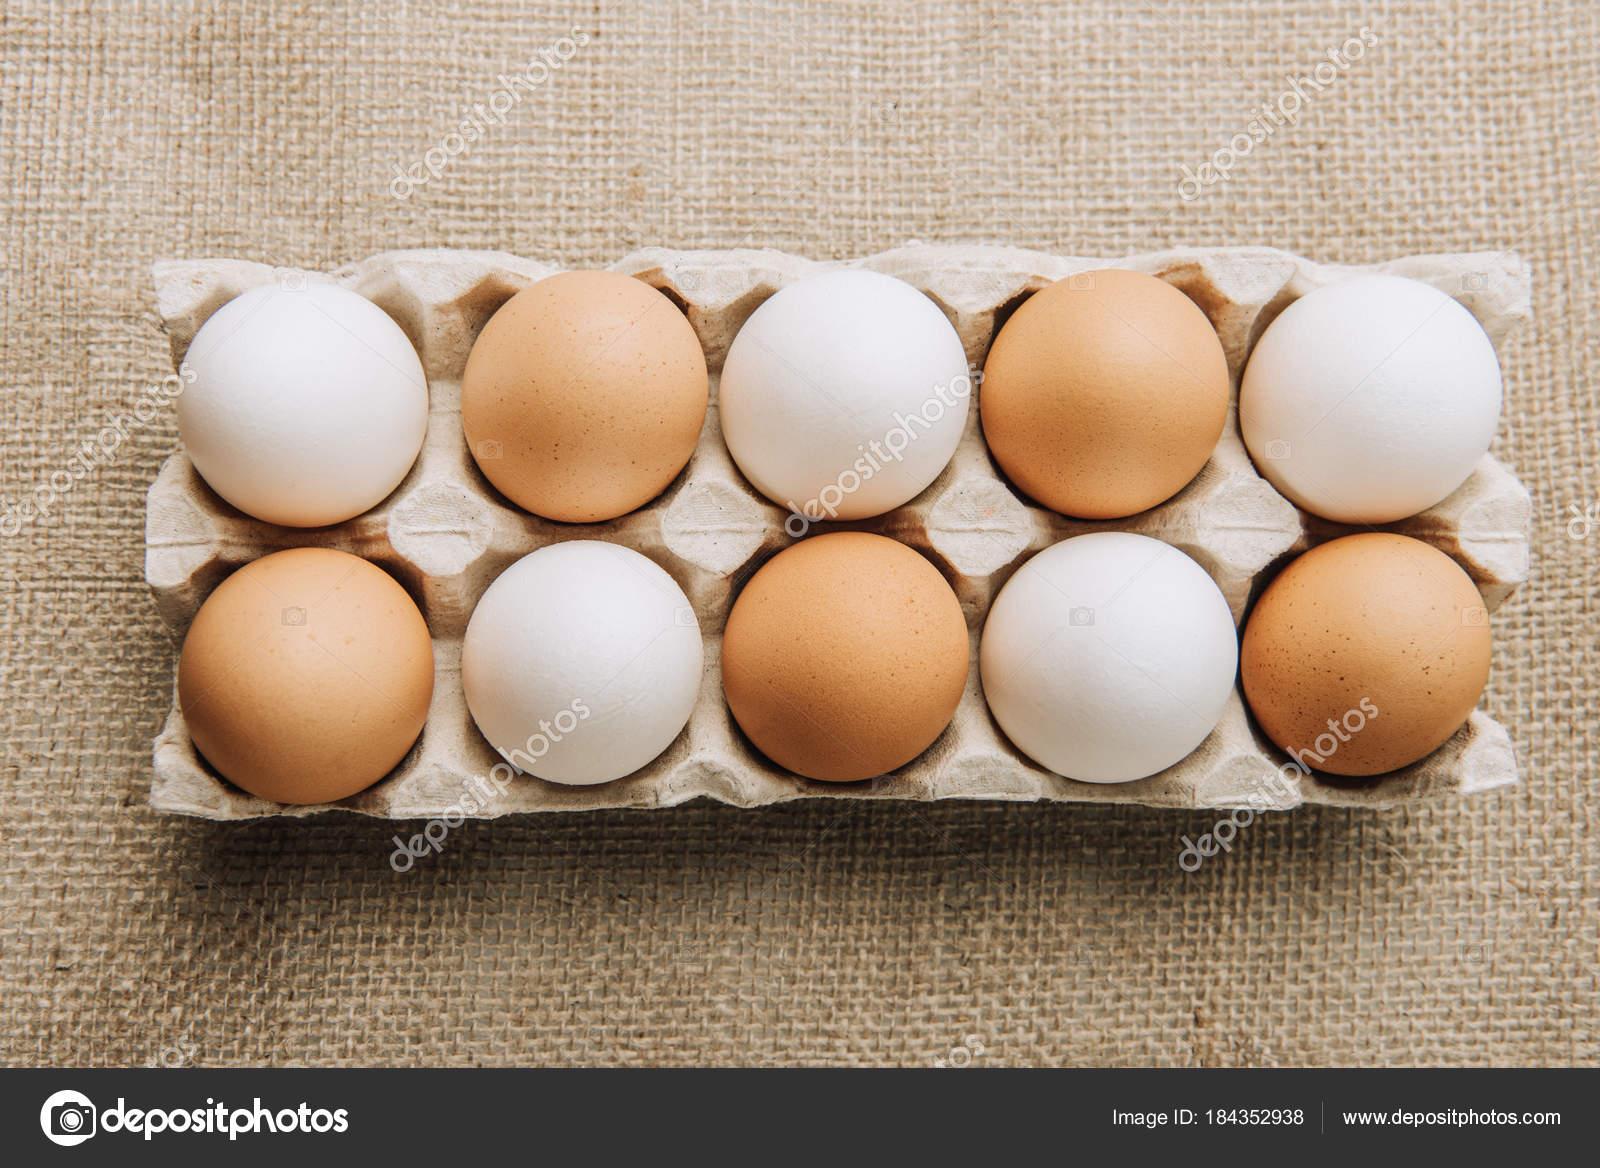 White Brown Eggs Laying Egg Carton Sackcloth